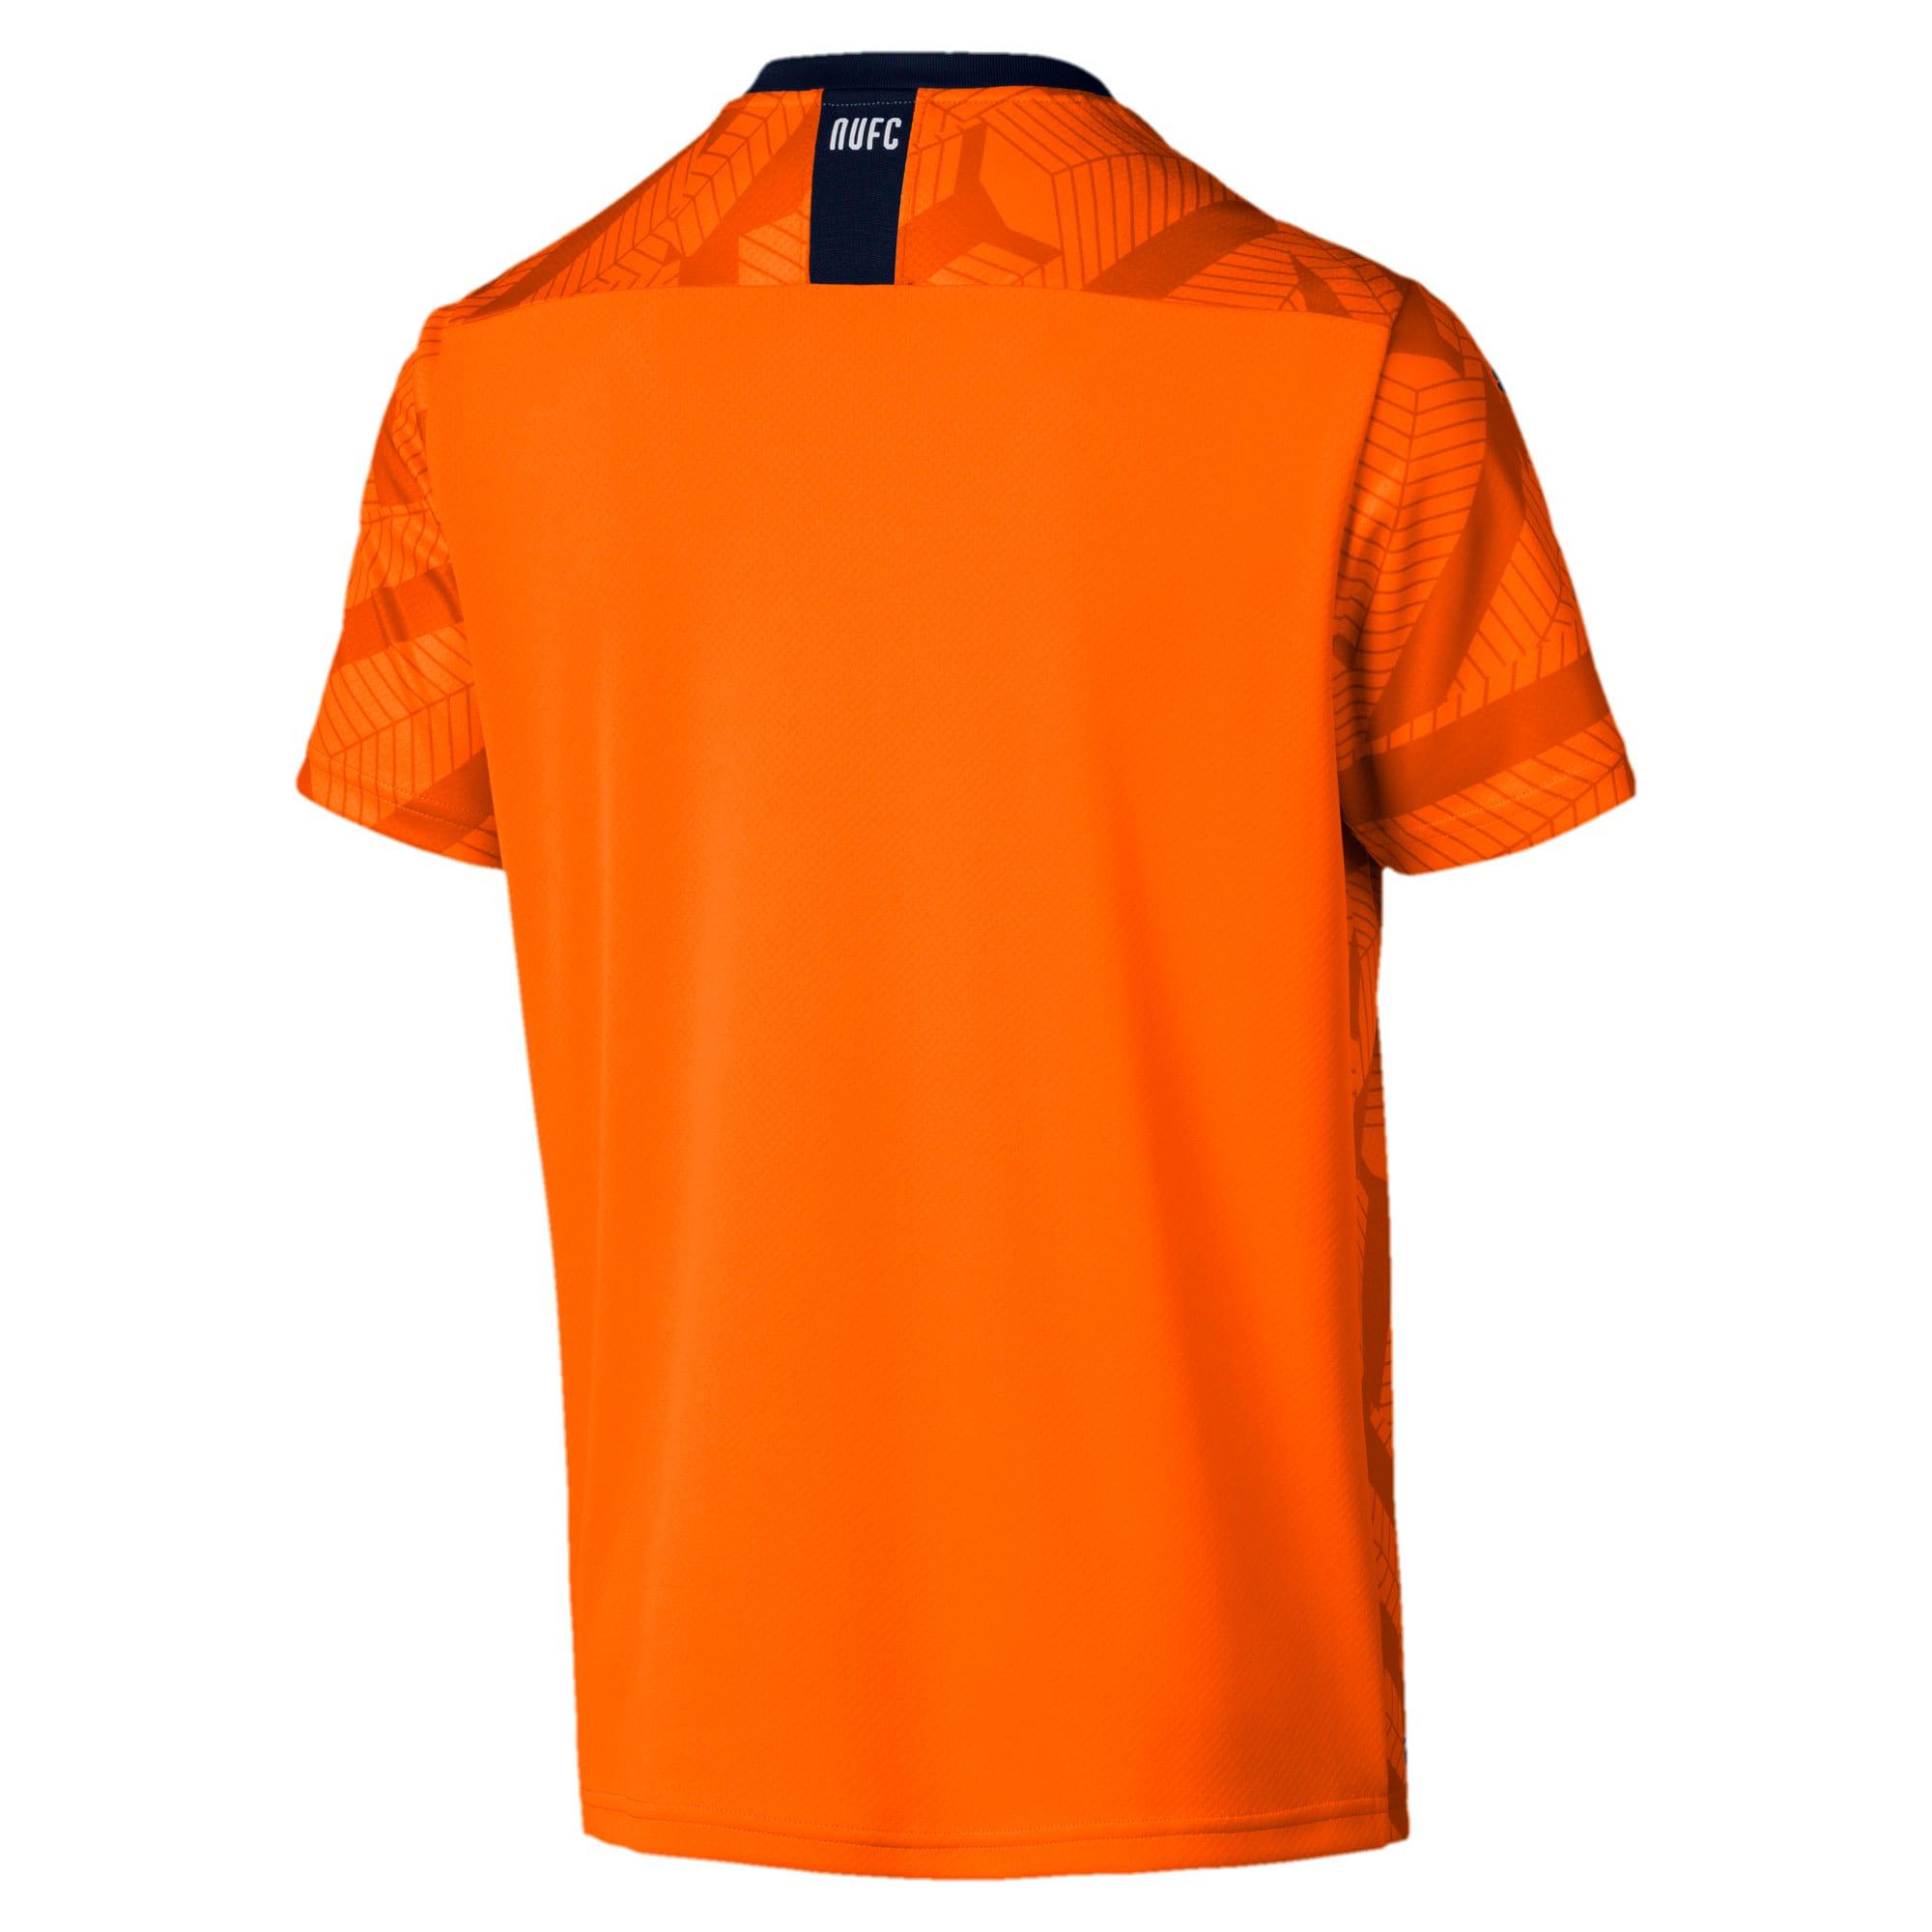 Thumbnail 2 of Newcastle United FC Men's Third Replica Short Sleeve Jersey, Vibrant Orange-Peacoat, medium